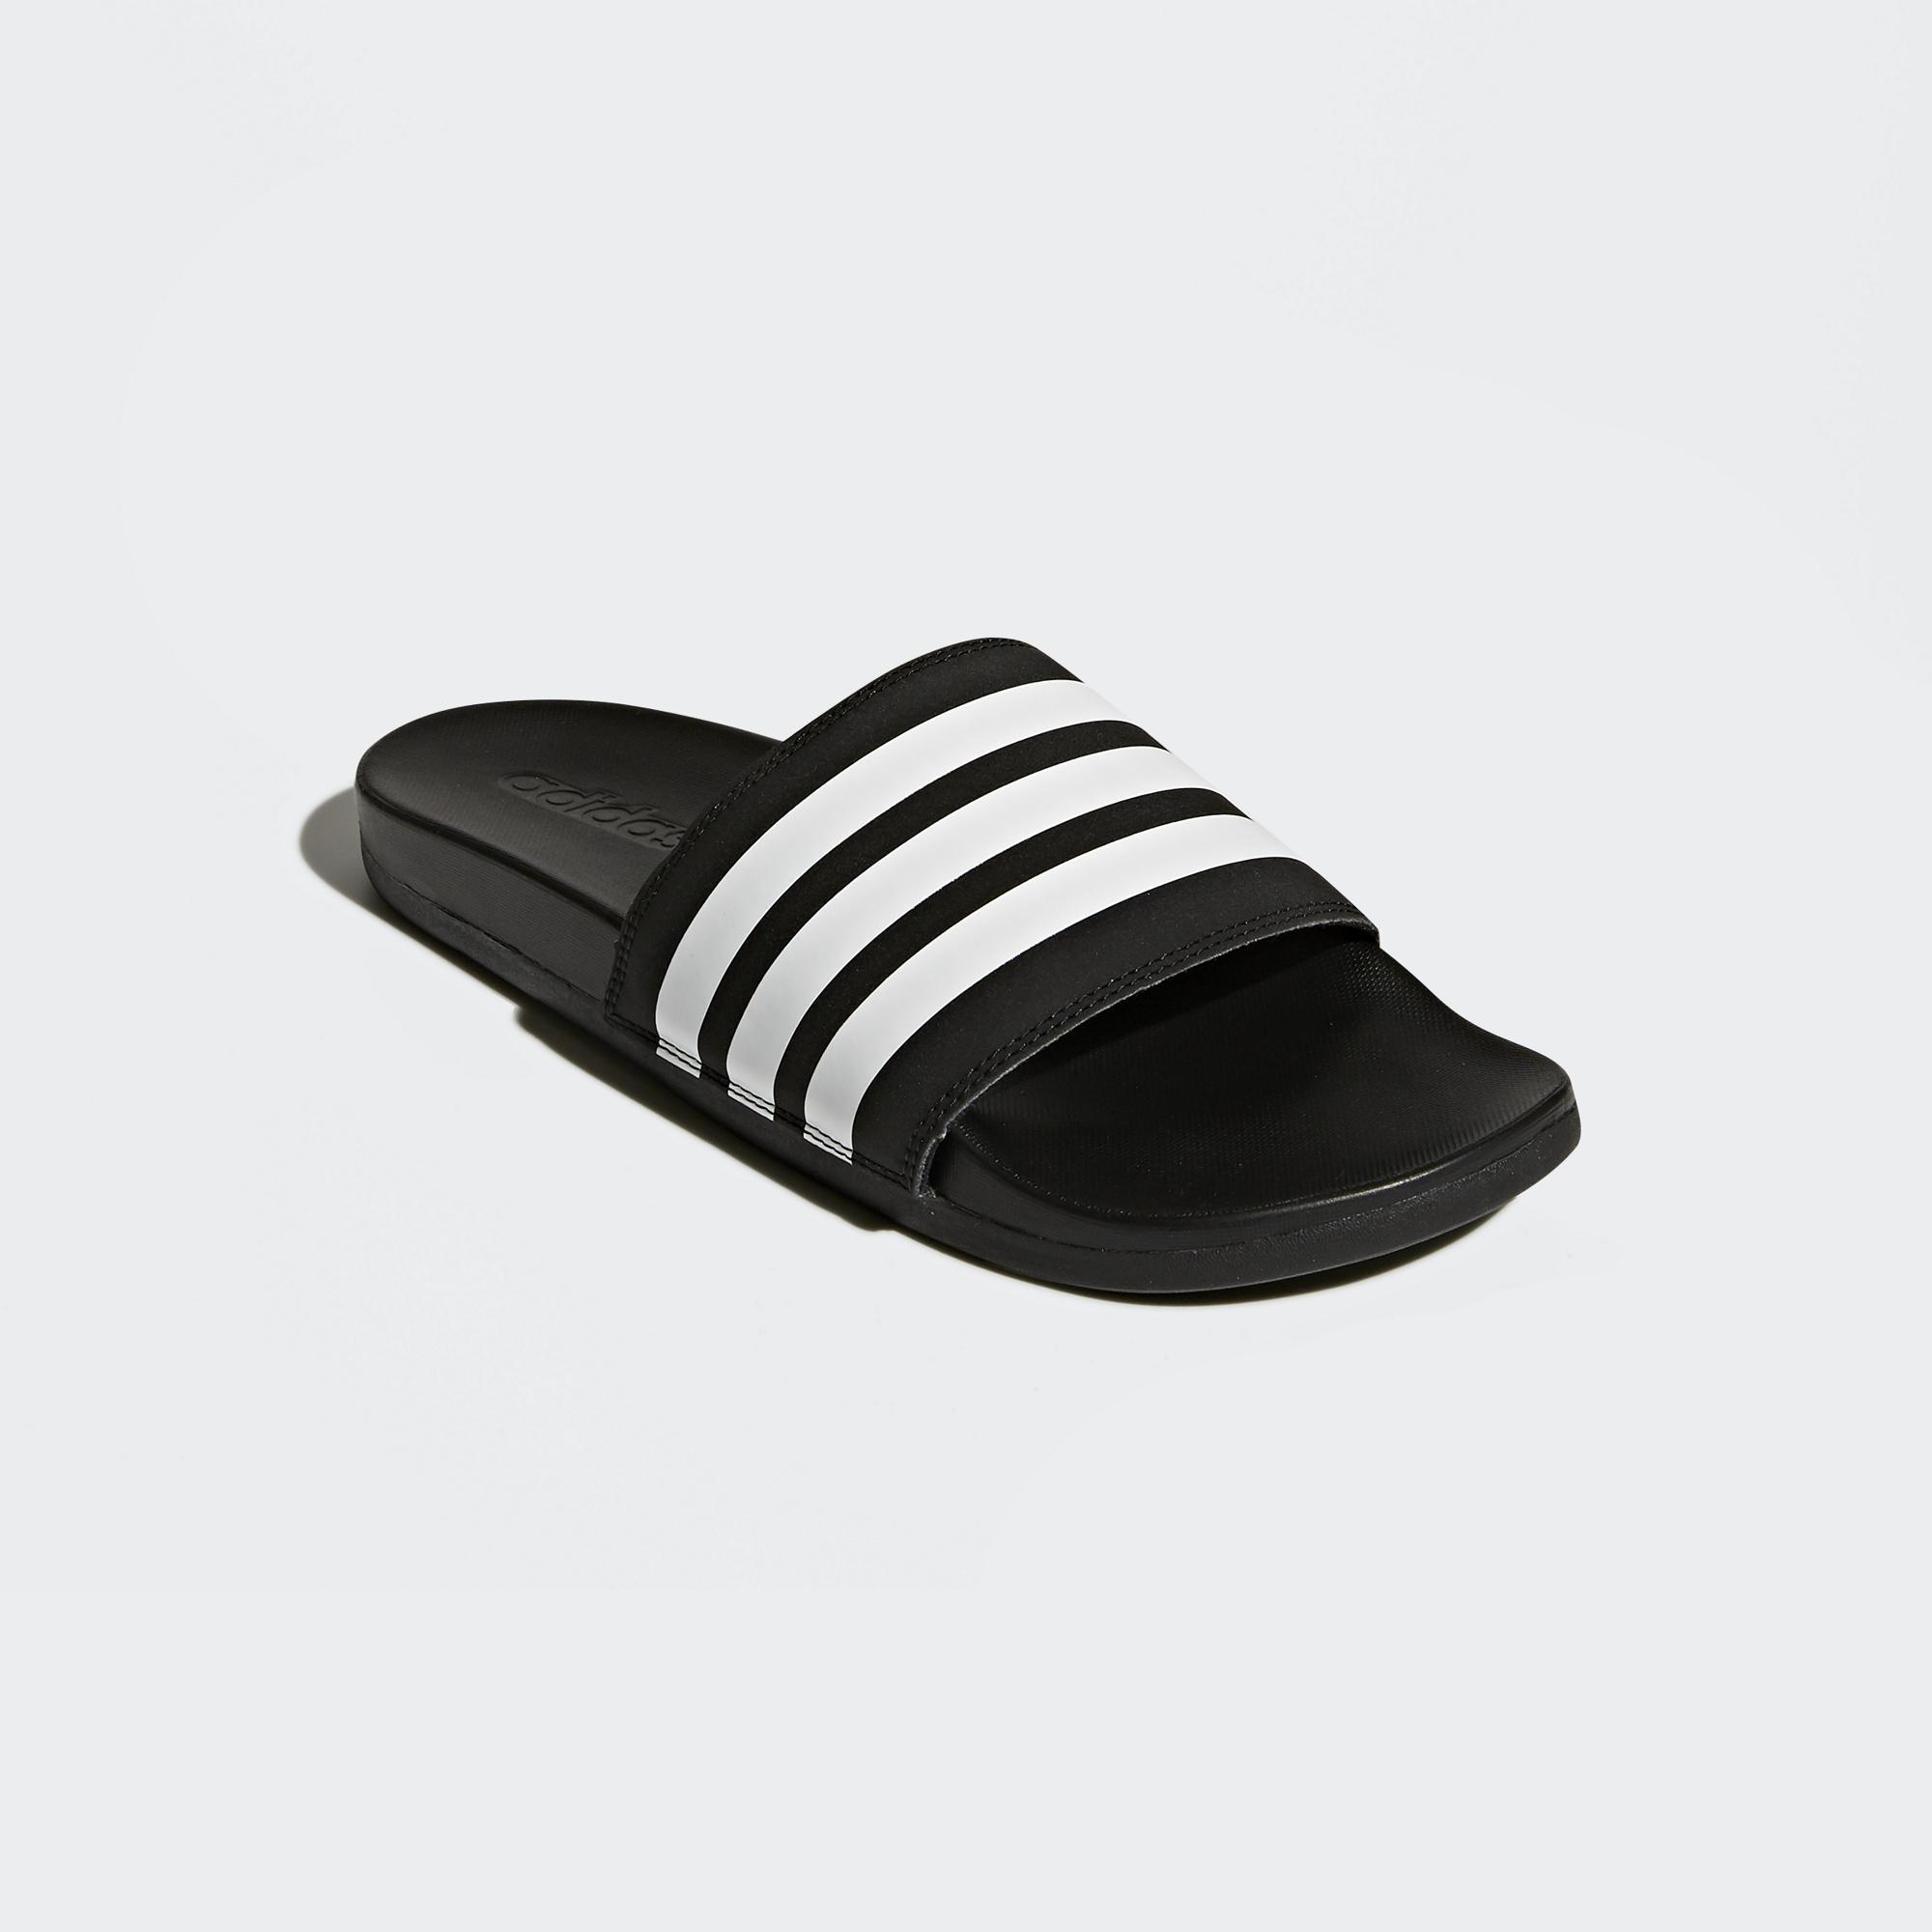 Buy Adidas Slides Online   lazada.com.ph